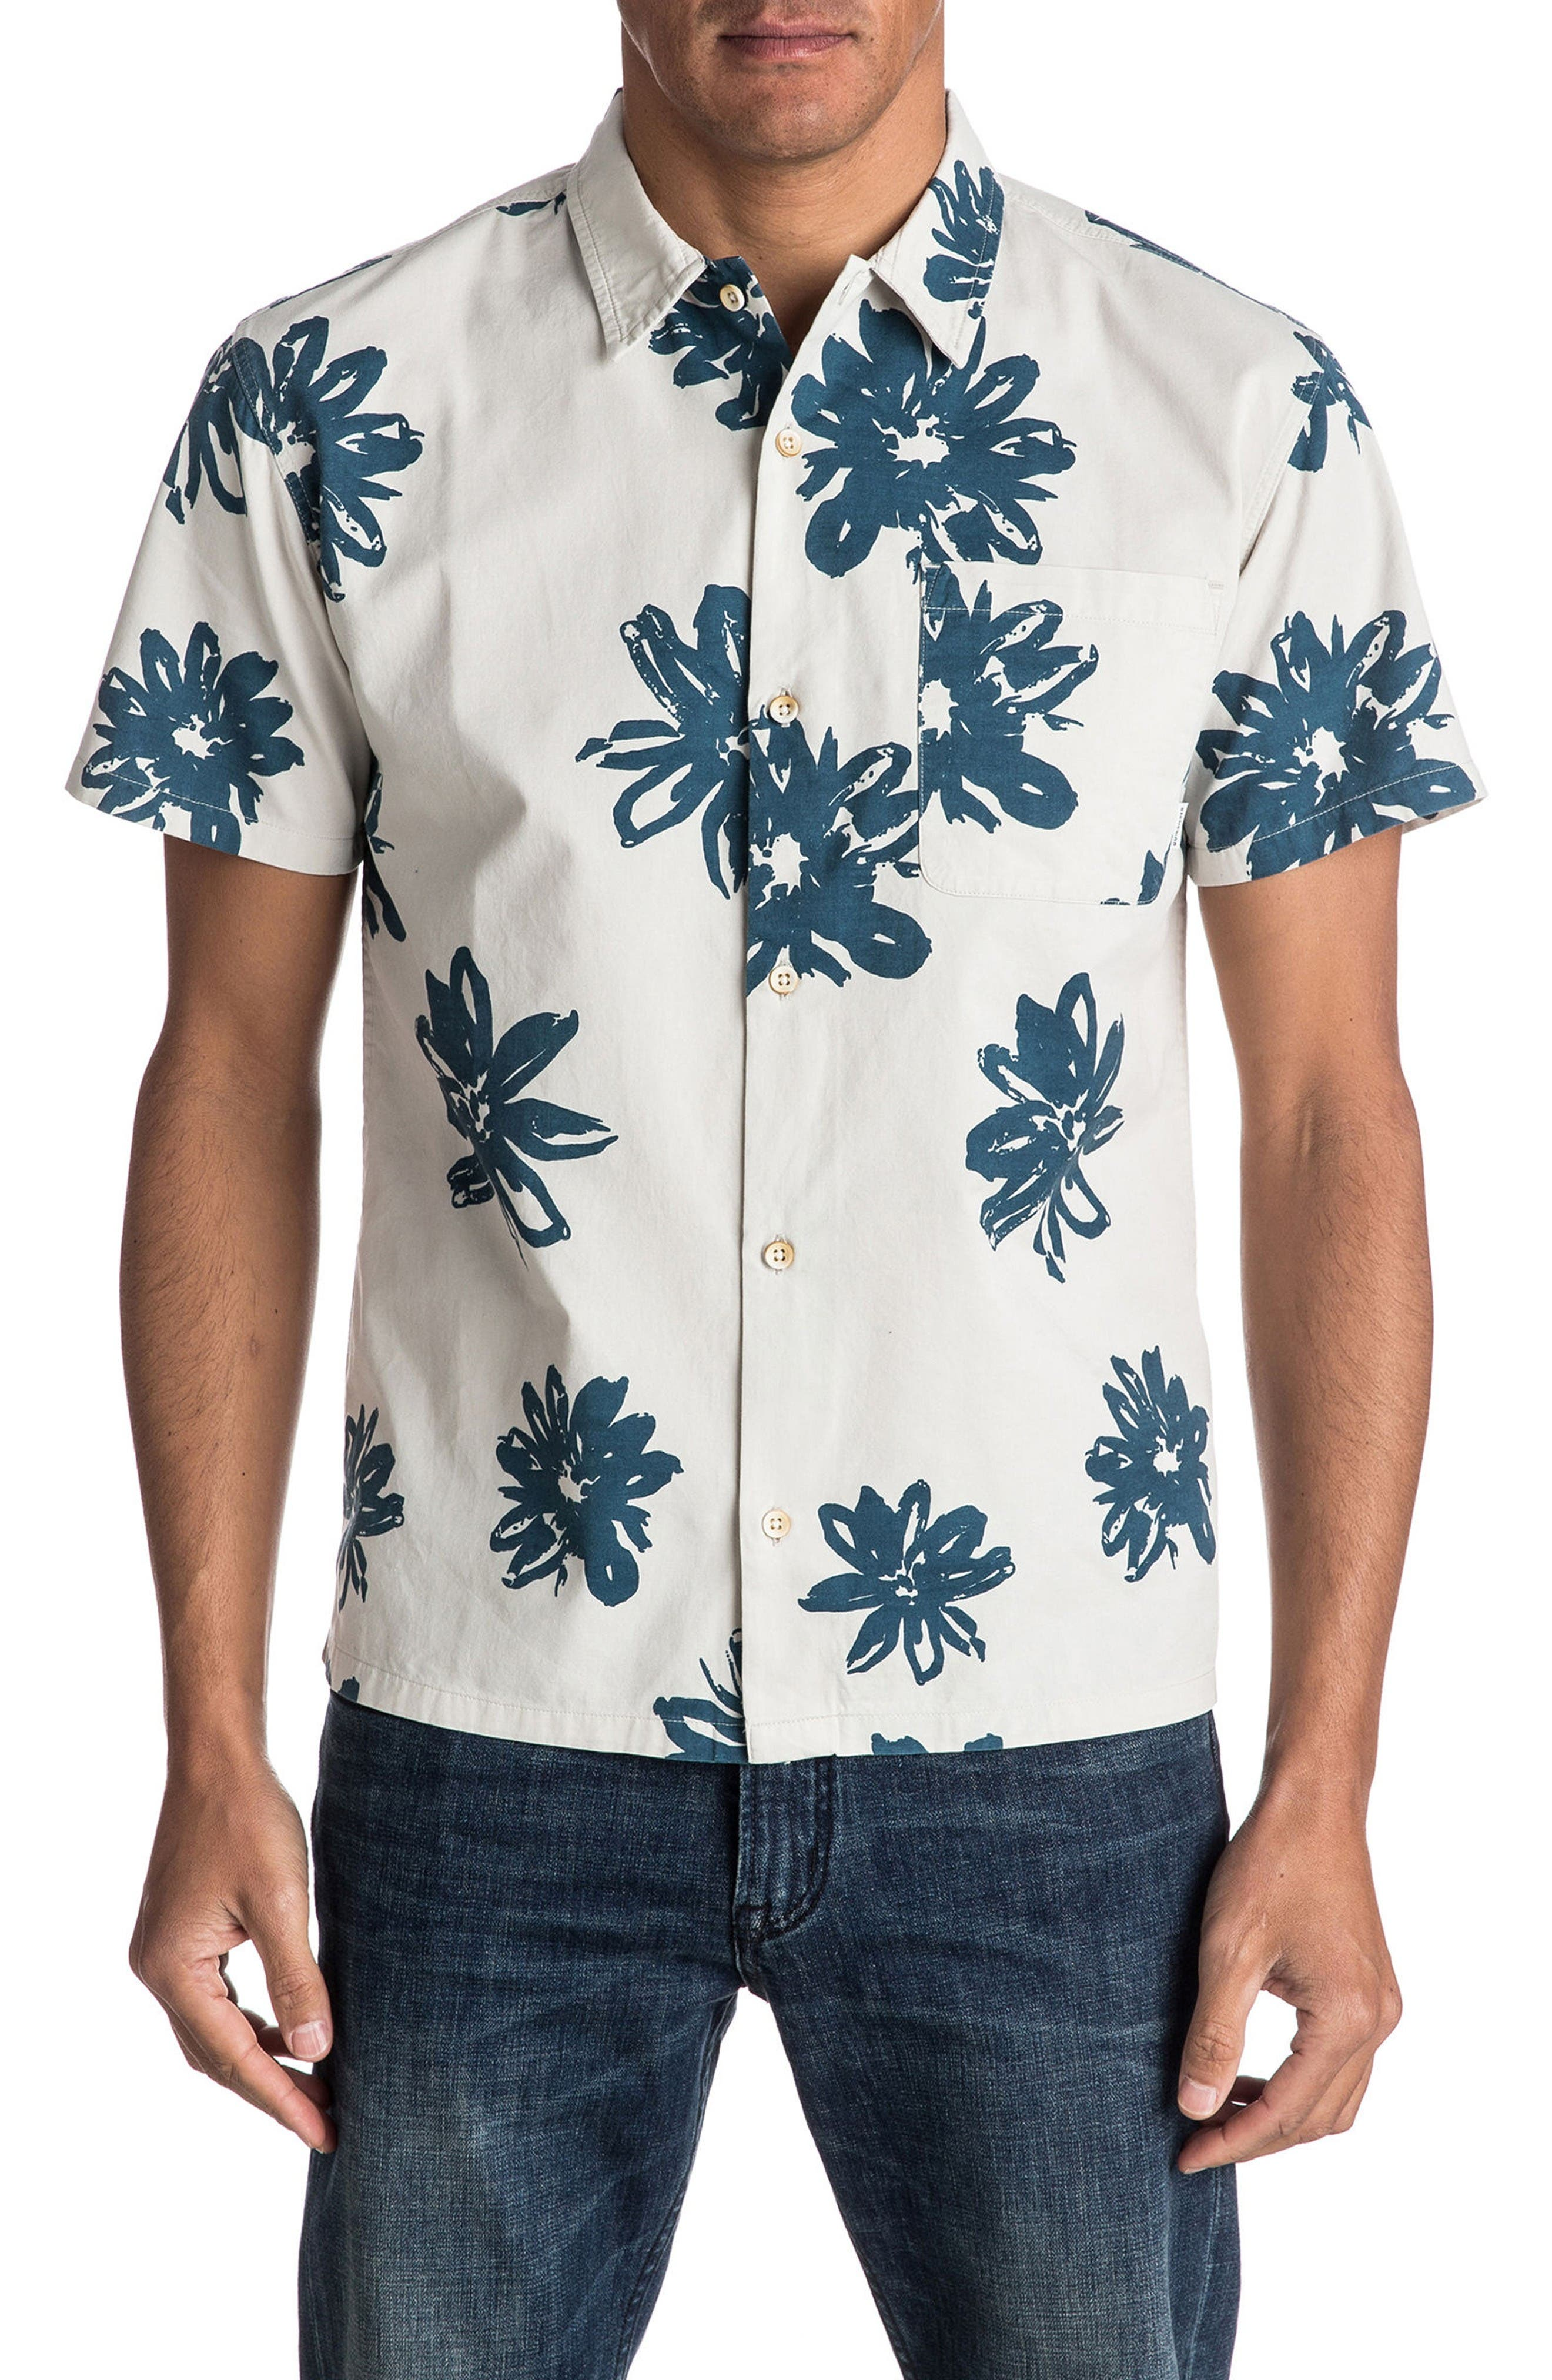 Quiksilver South Beach Dimes Woven Shirt